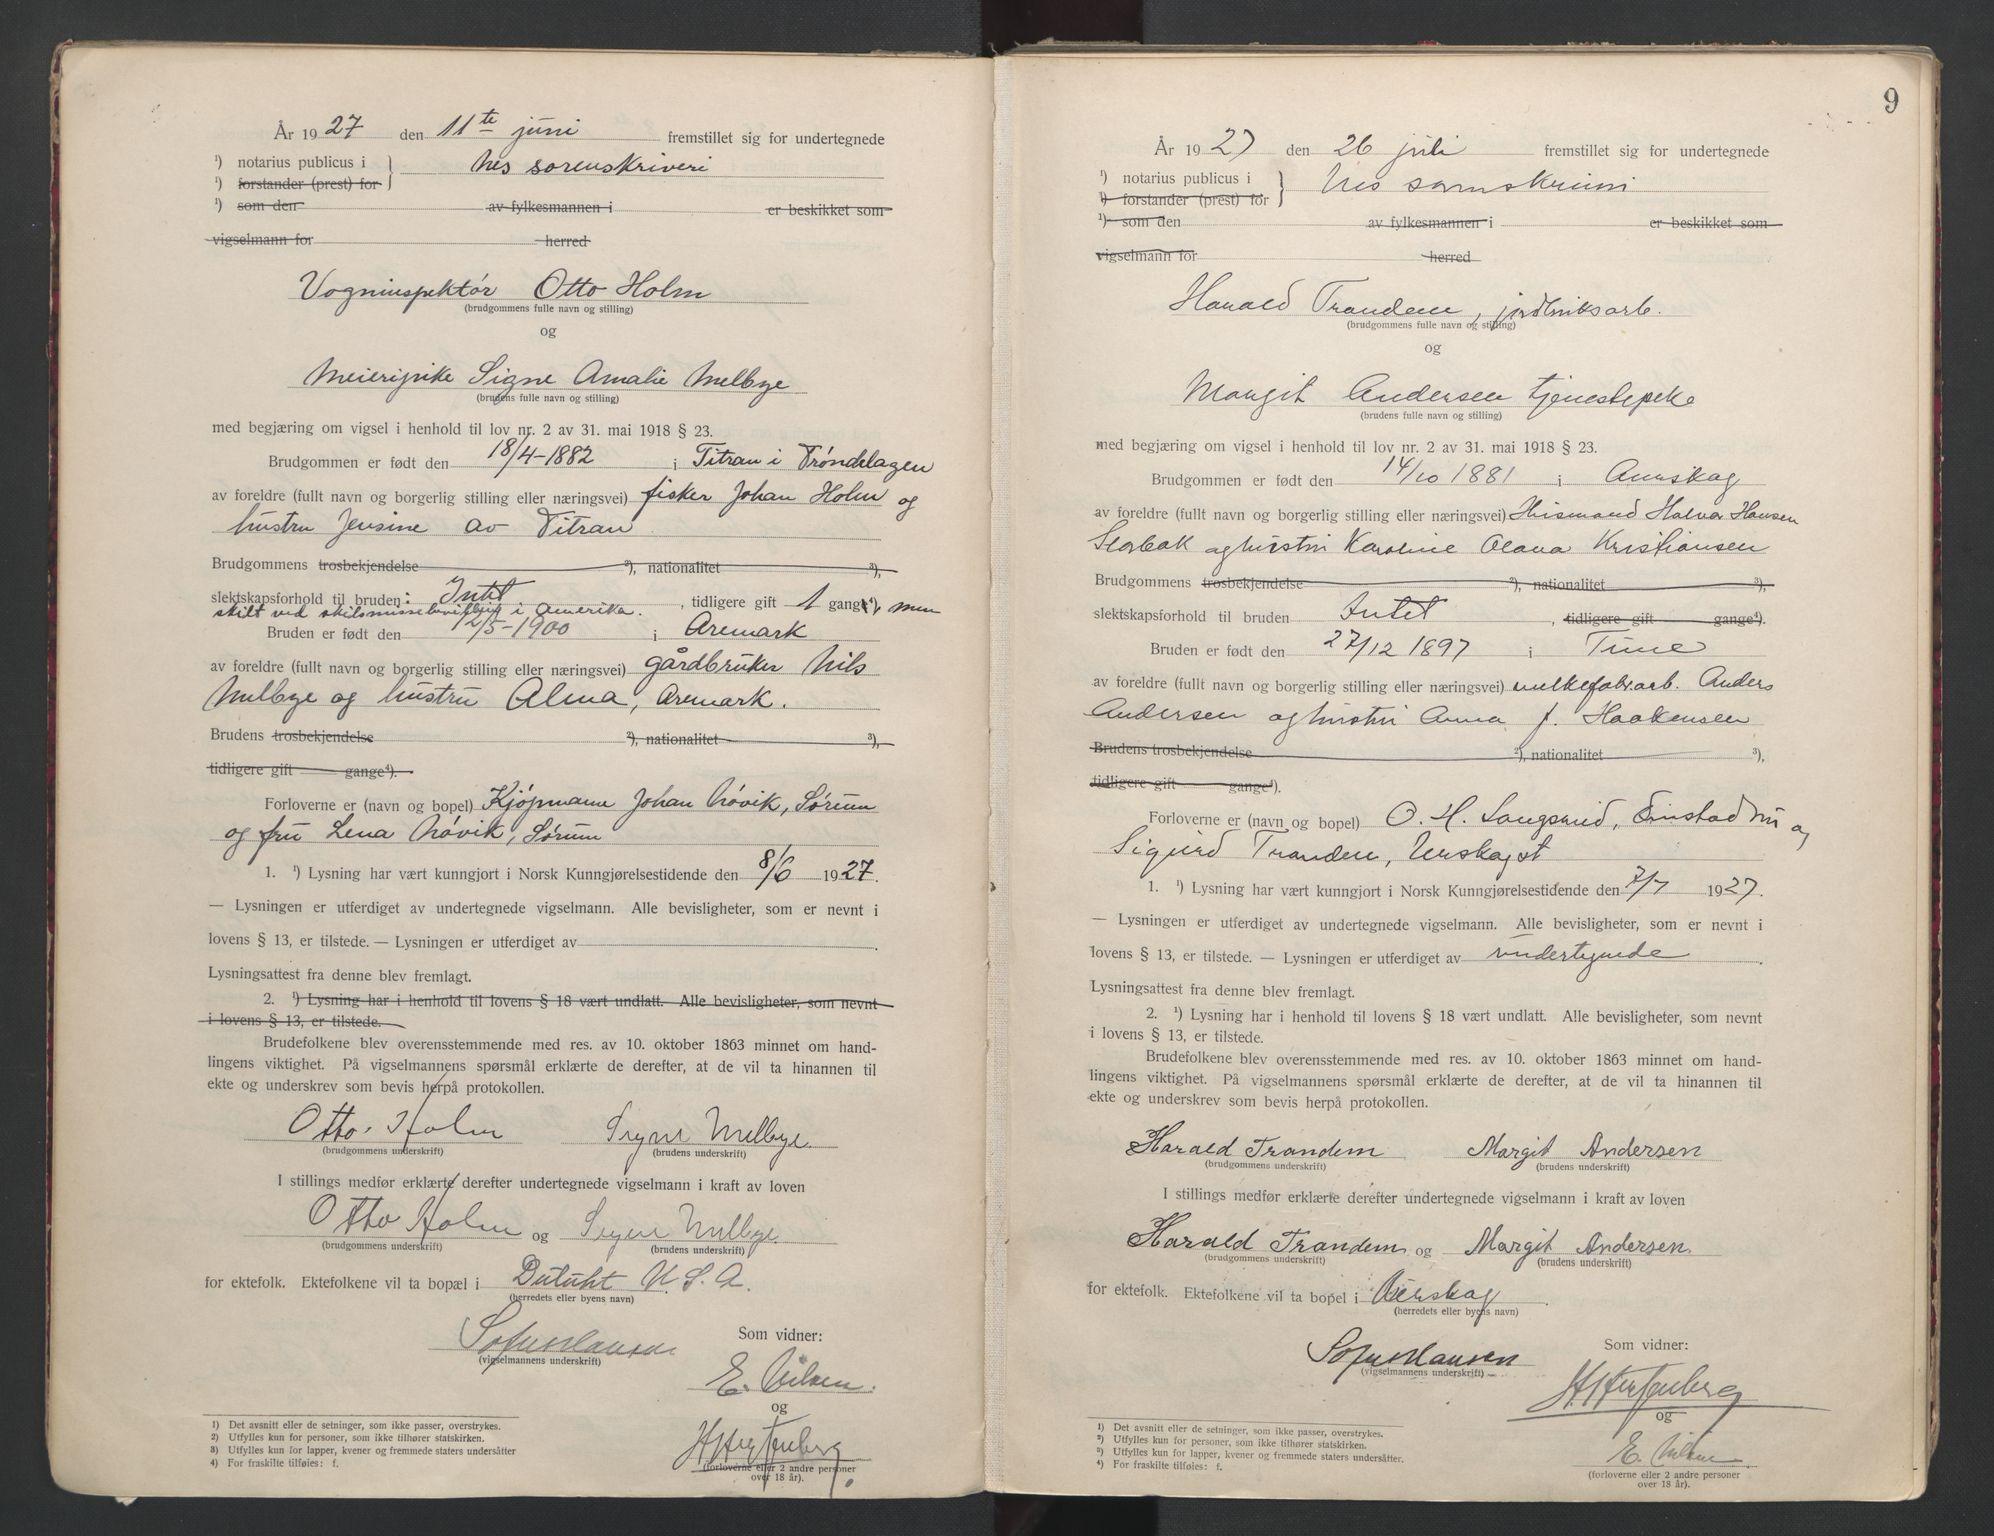 SAO, Nes tingrett, L/Lc/Lca/L0001: Vigselbok, 1920-1943, s. 9